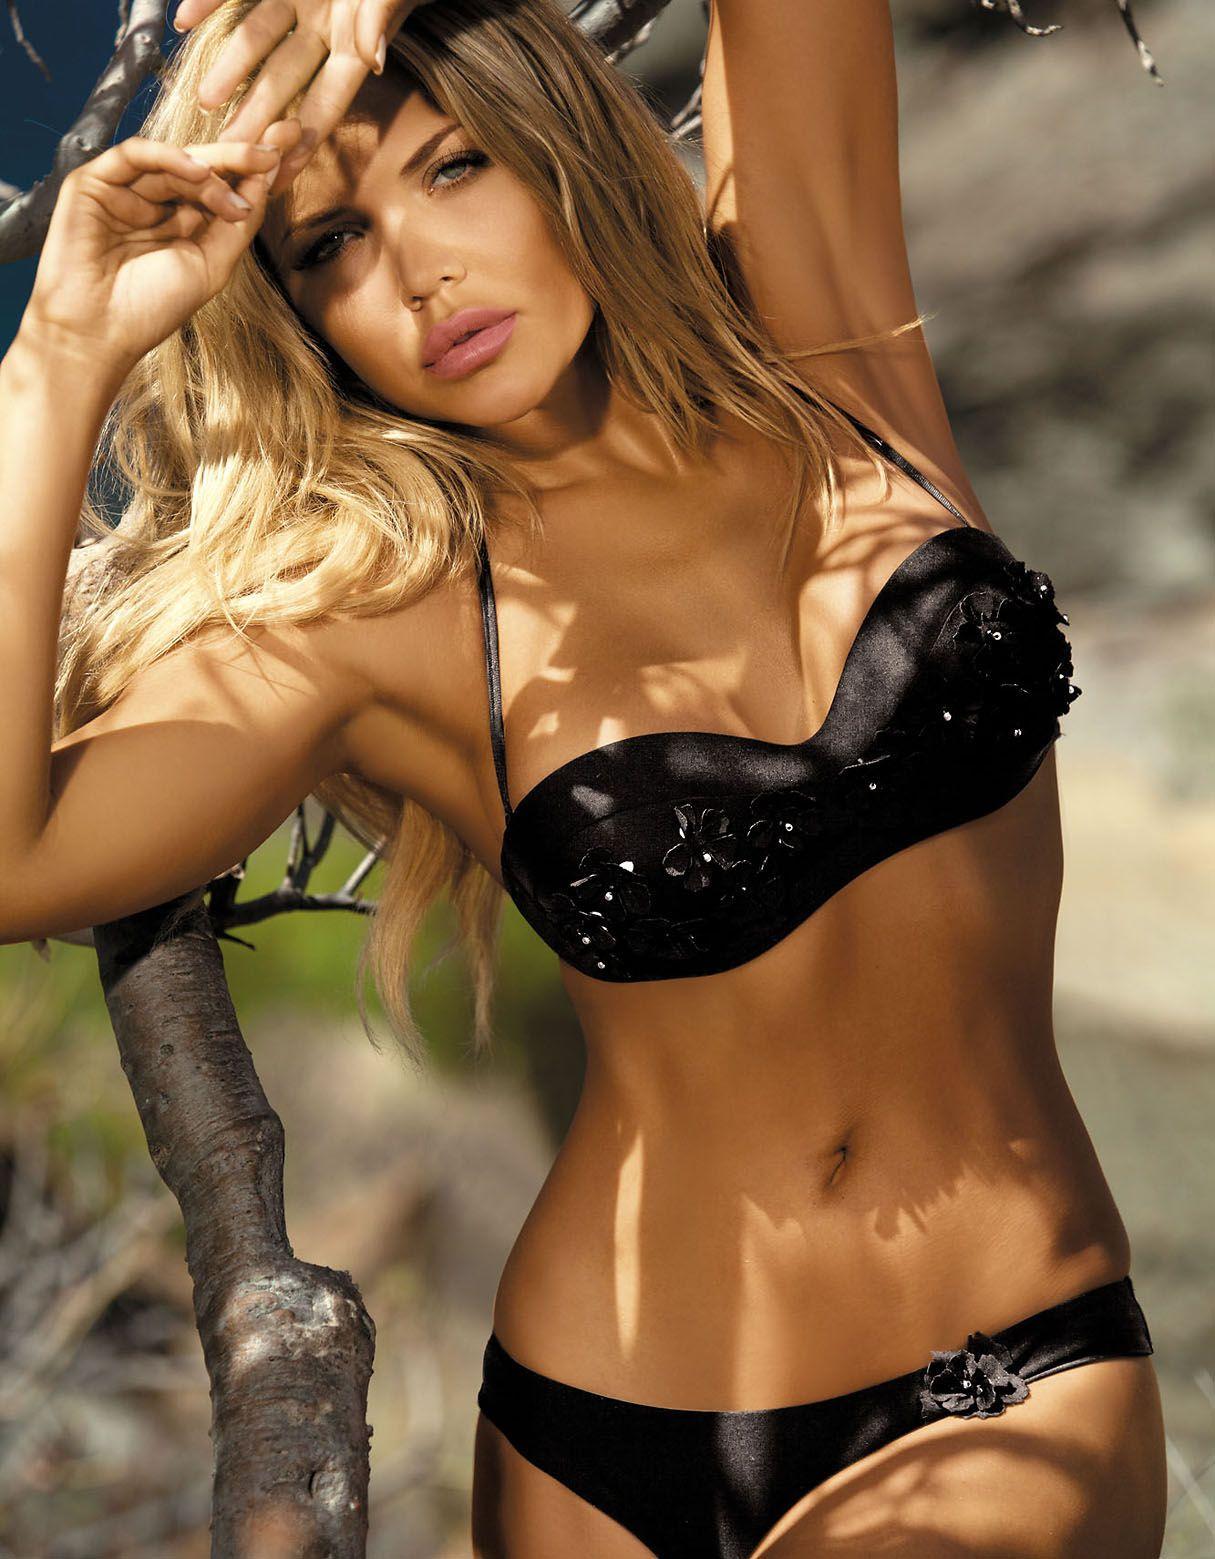 Tetyana Veryovkina nude (27 photo) Sideboobs, YouTube, braless